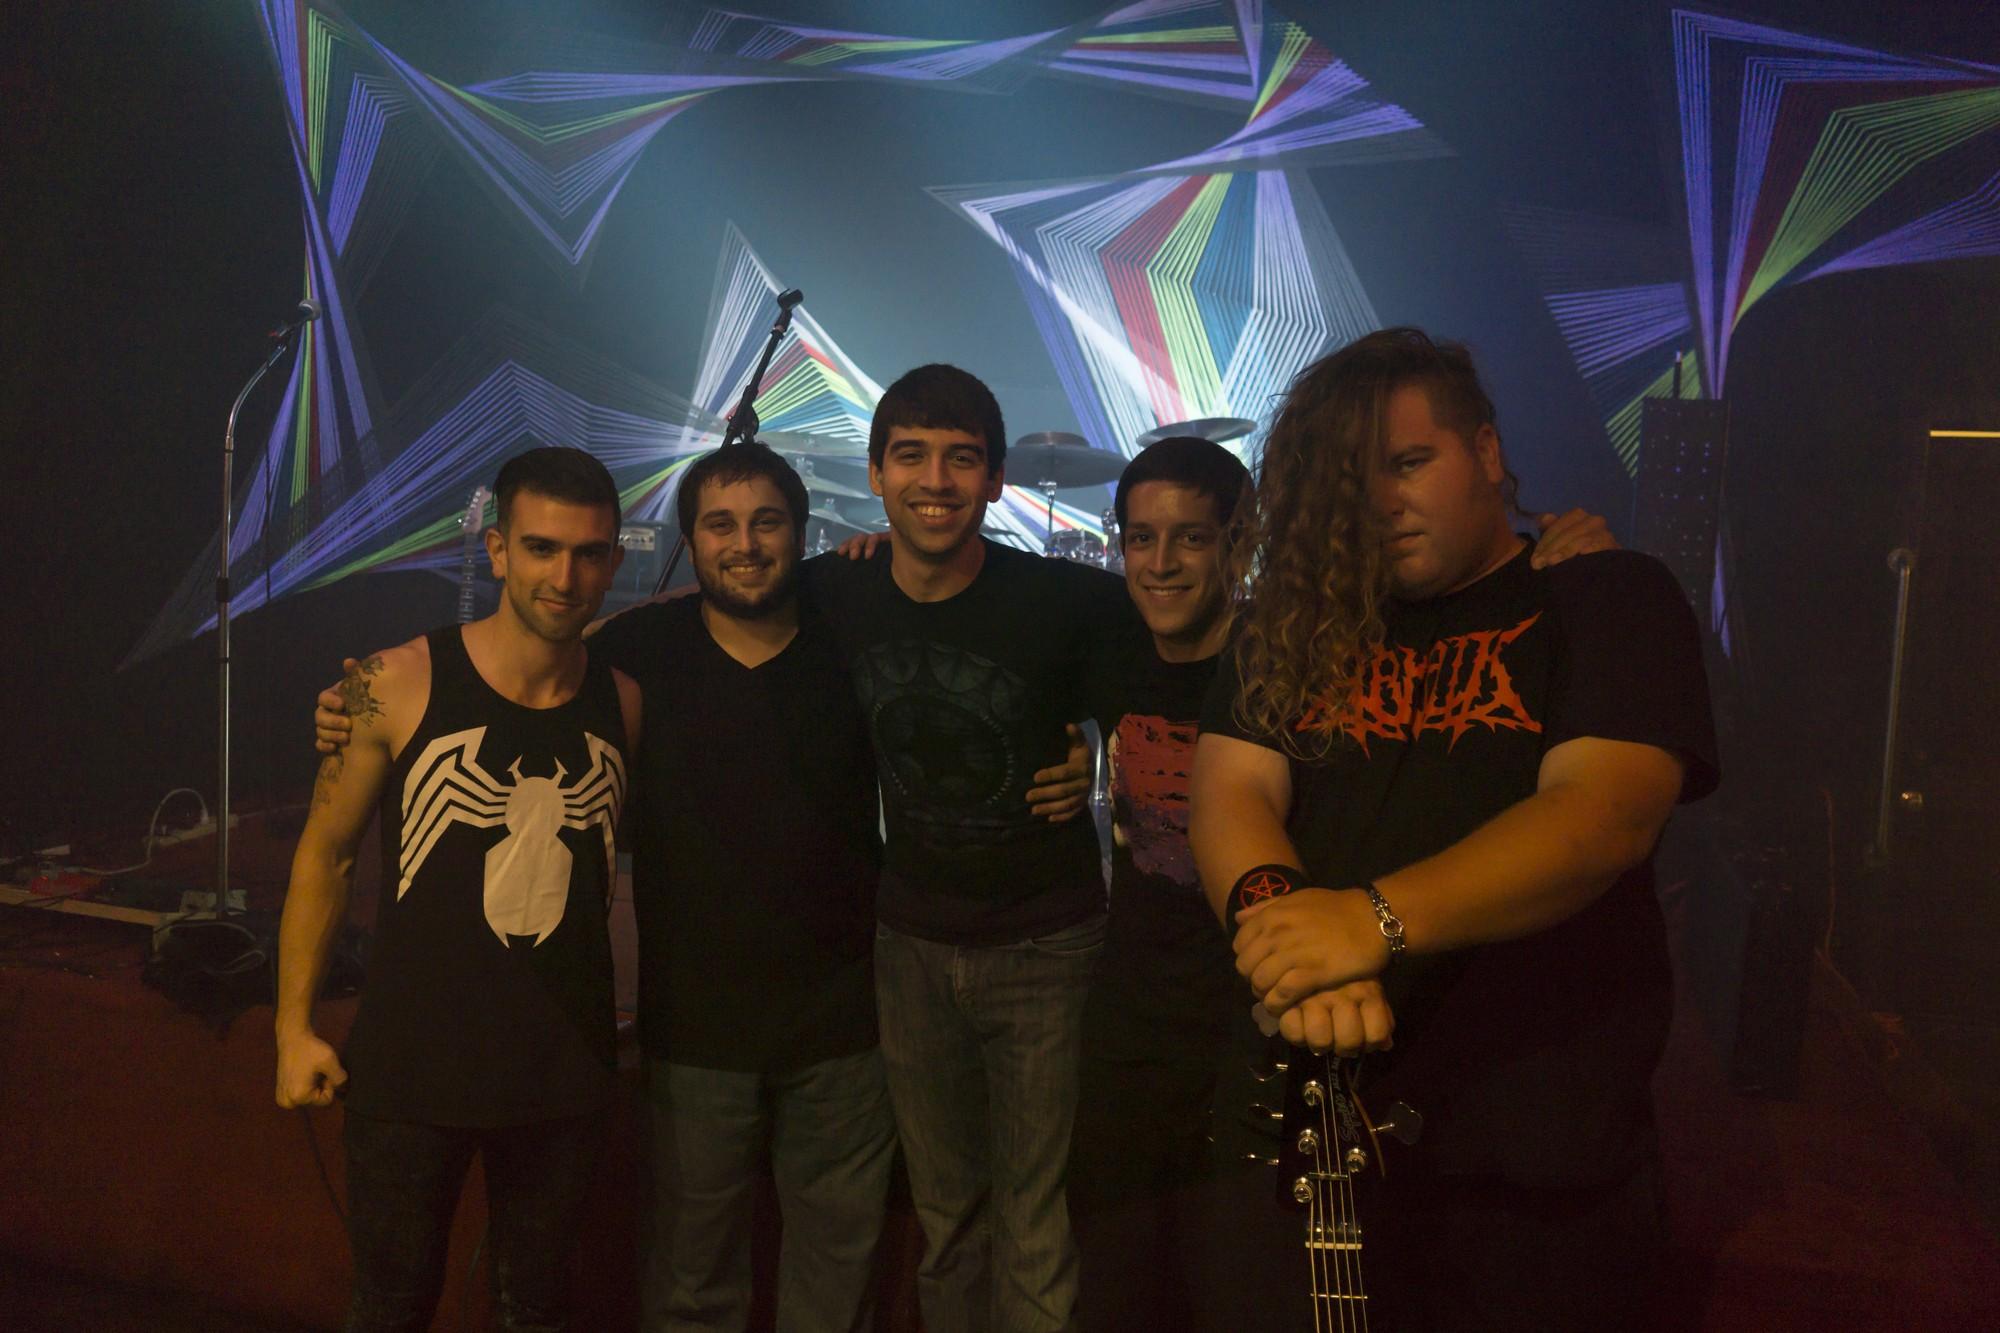 Aeonic Impulse (Left to Right): Gasper Gray (Lead Vocals) Jordan Salfity (Lead Guitars/Backup Vocals) Ryan Rappaport (Rhythm Guitars) Fernando